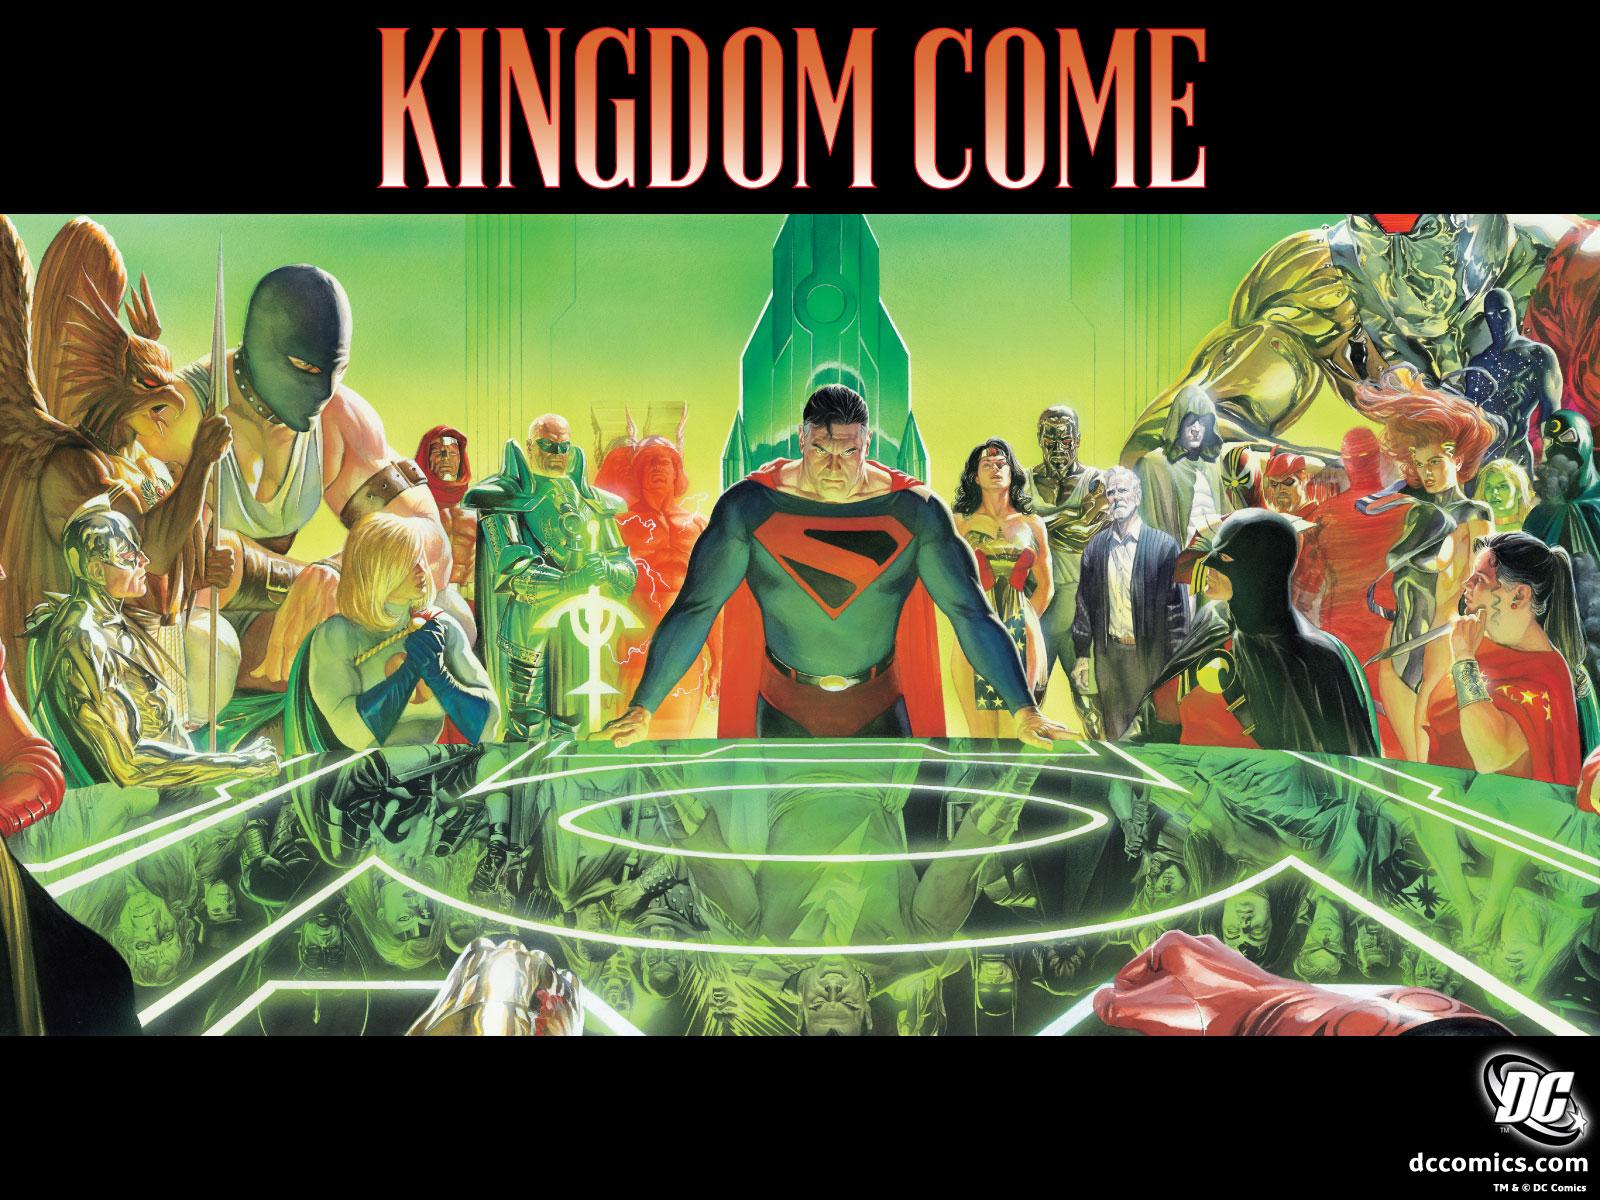 «Азбука» анонсировала выход графического романа Kingdome Come на русском языке